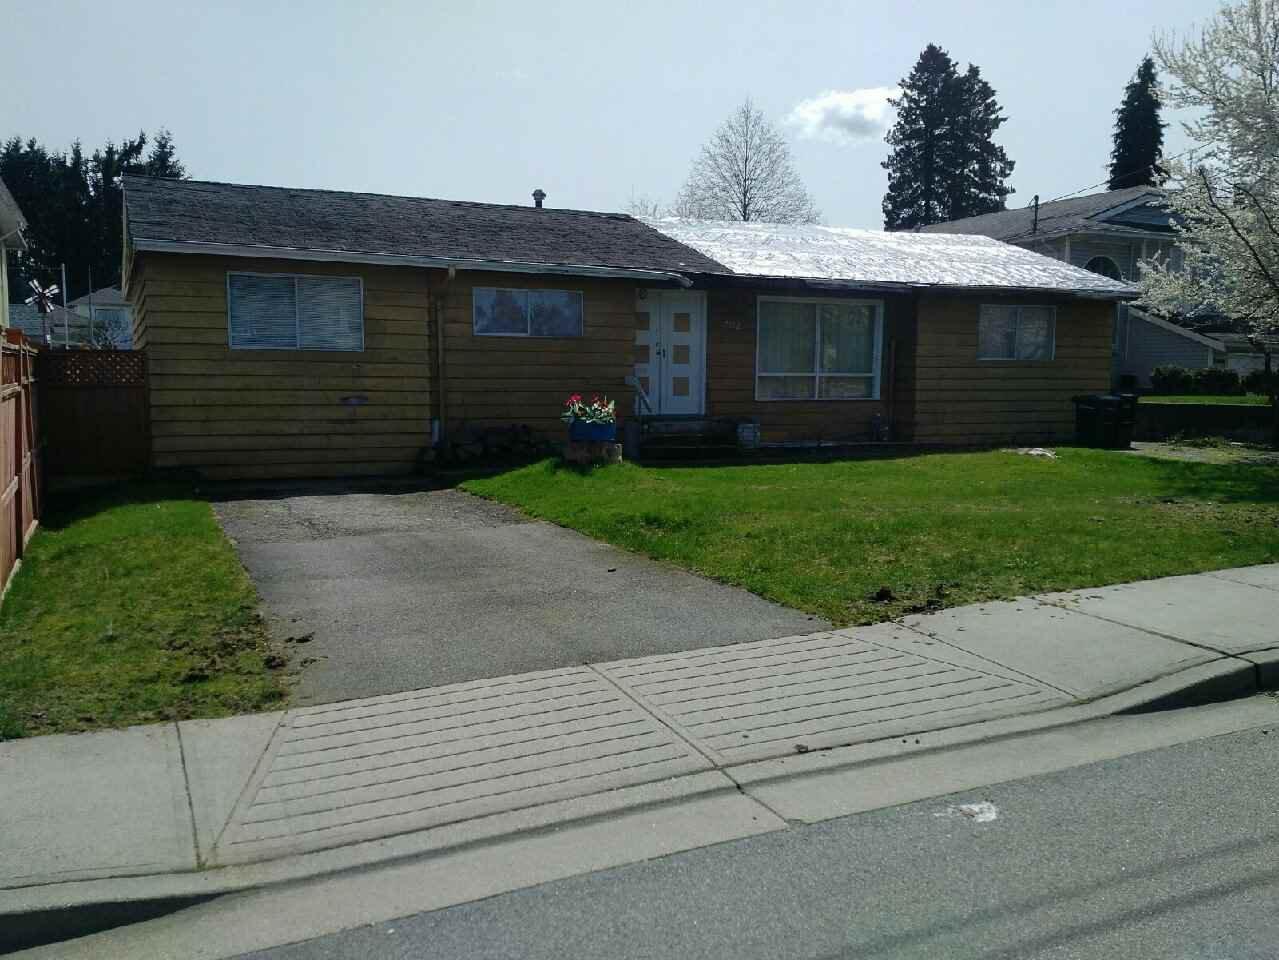 Main Photo: 7952 EDMONDS Street in Burnaby: East Burnaby House for sale (Burnaby East)  : MLS®# R2155080